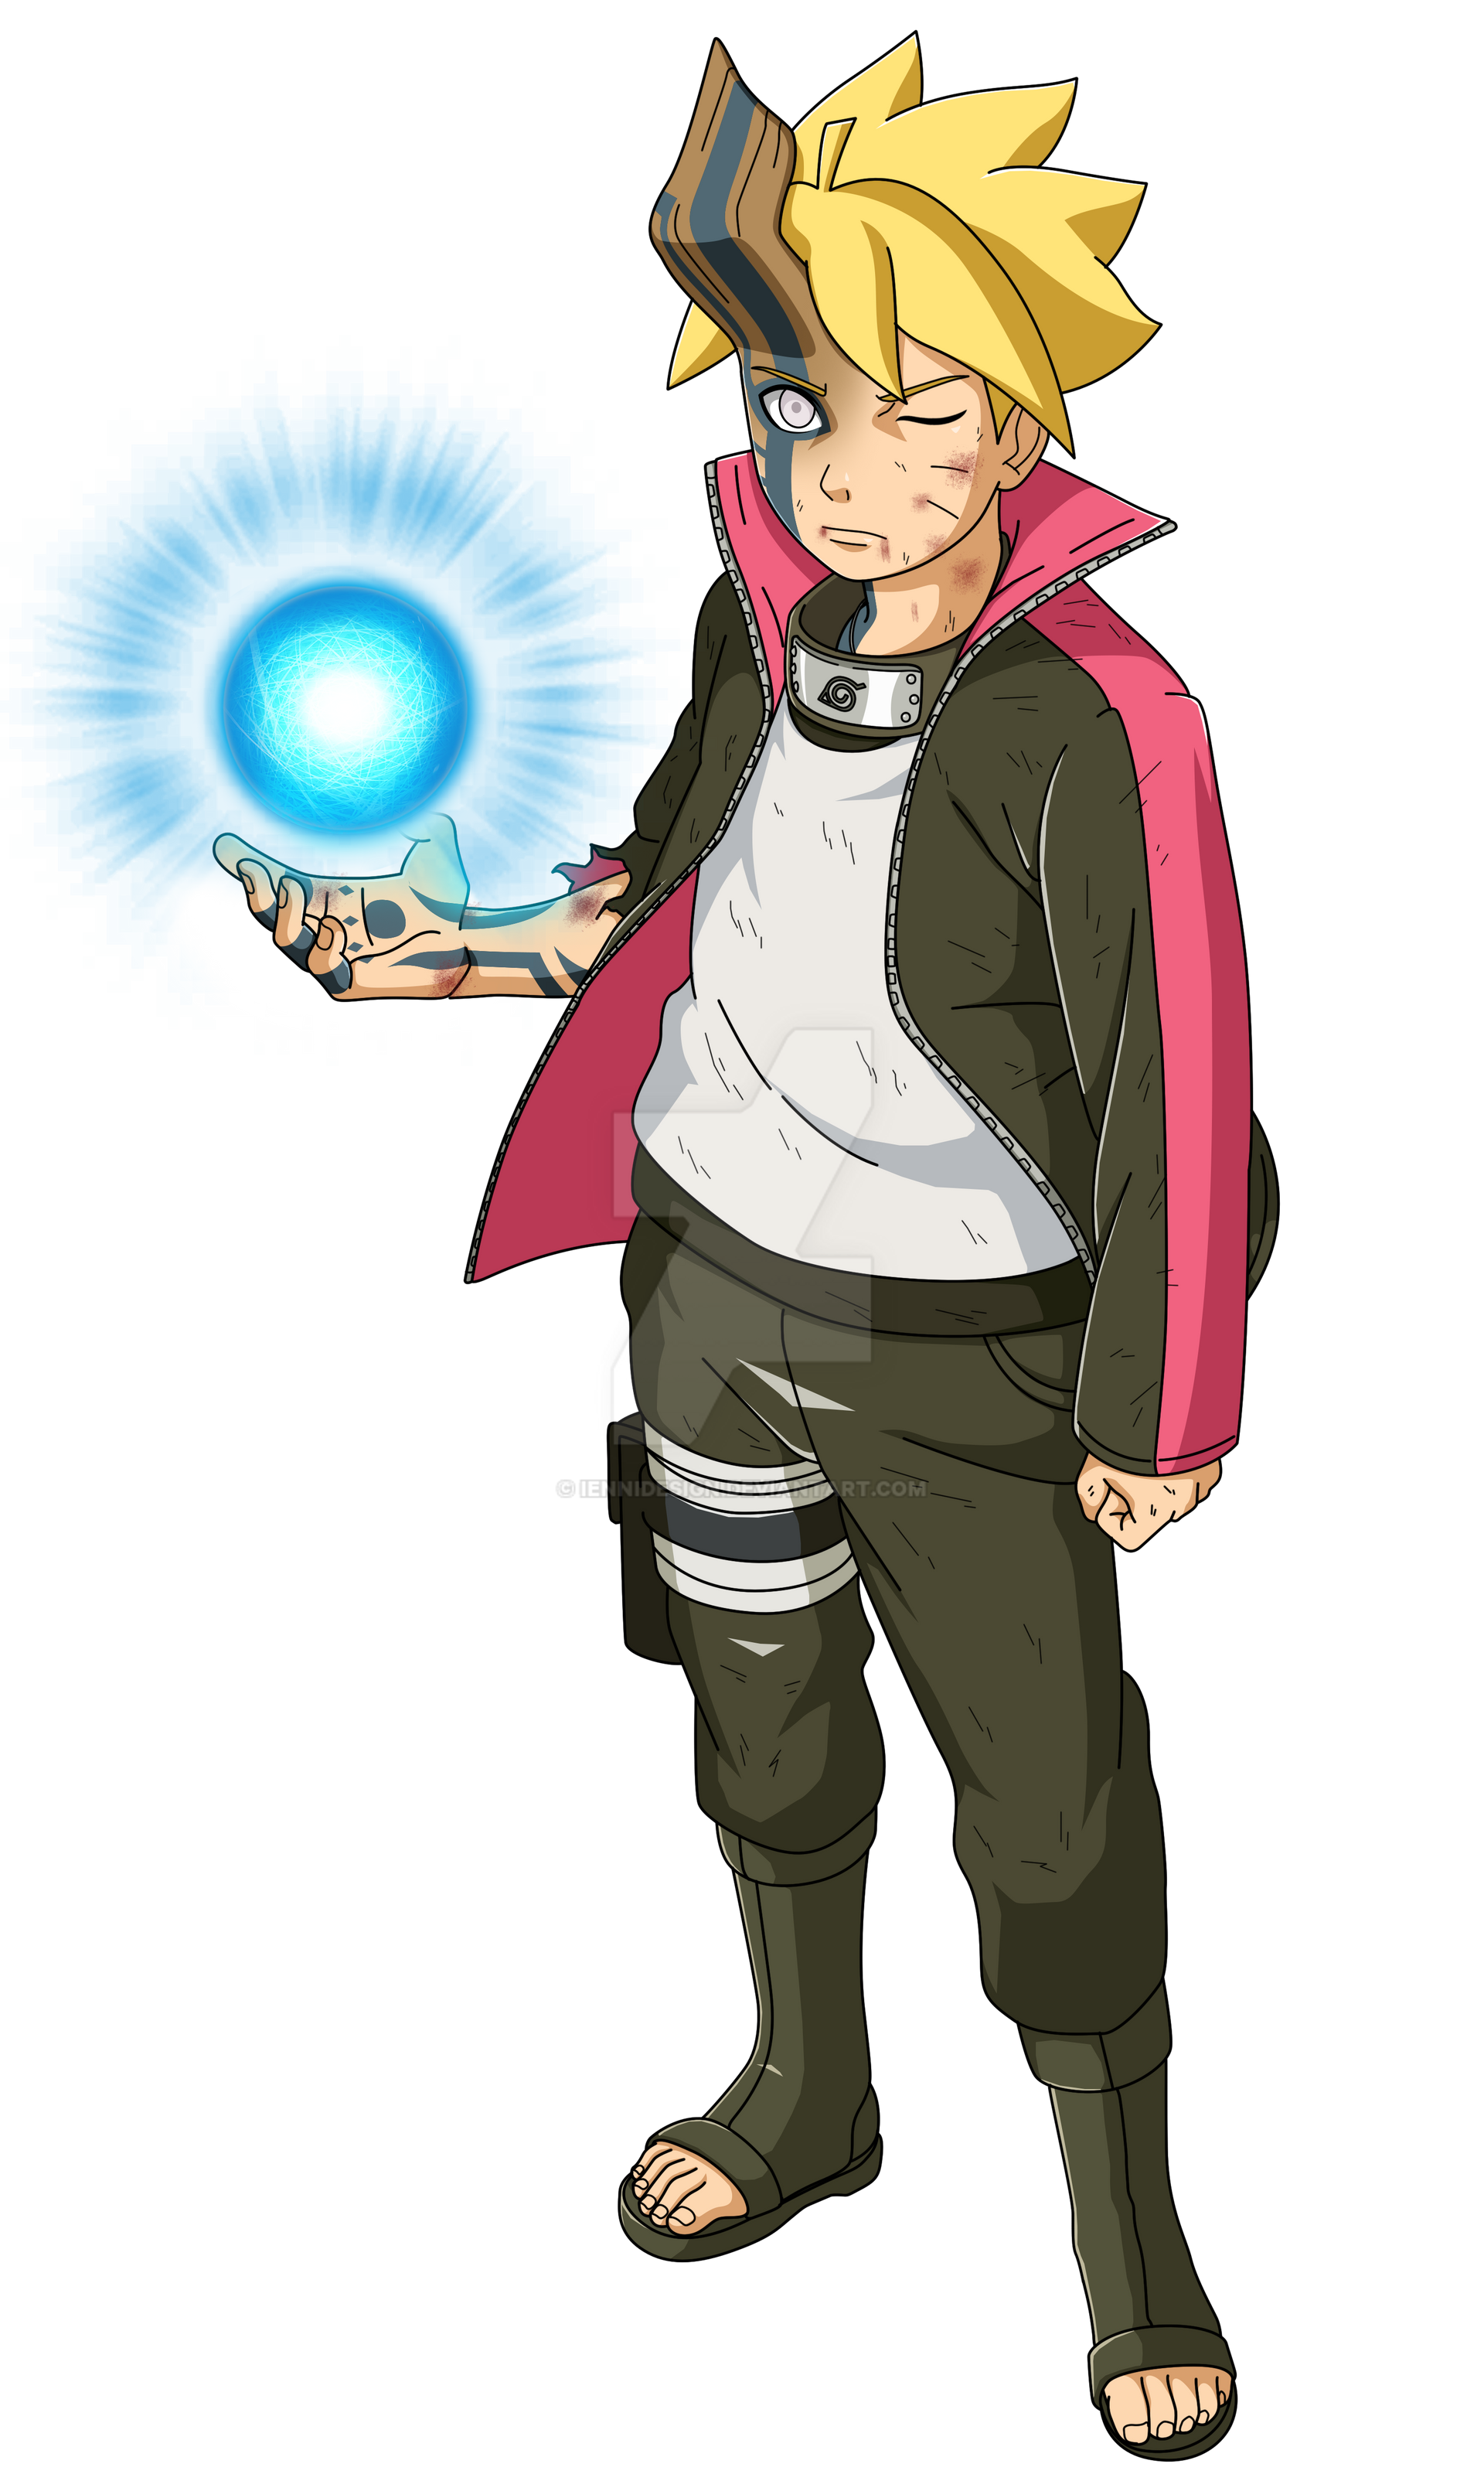 Boruto:Naruto Next Generation|Boruto (Momoshiki) by iEnniDESIGN on DeviantArt